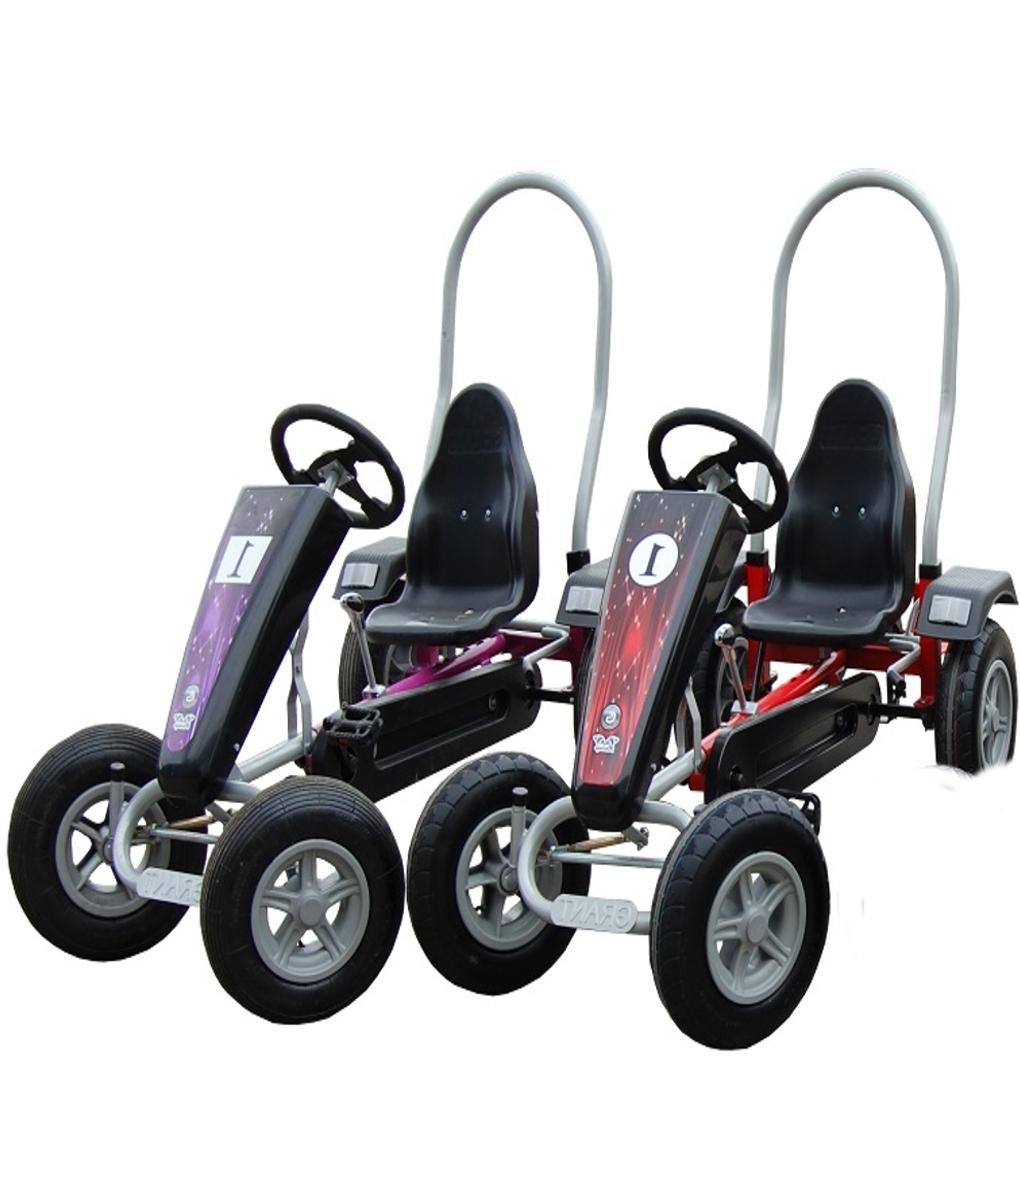 Grant Pedal Go Karts - Alpine Trading